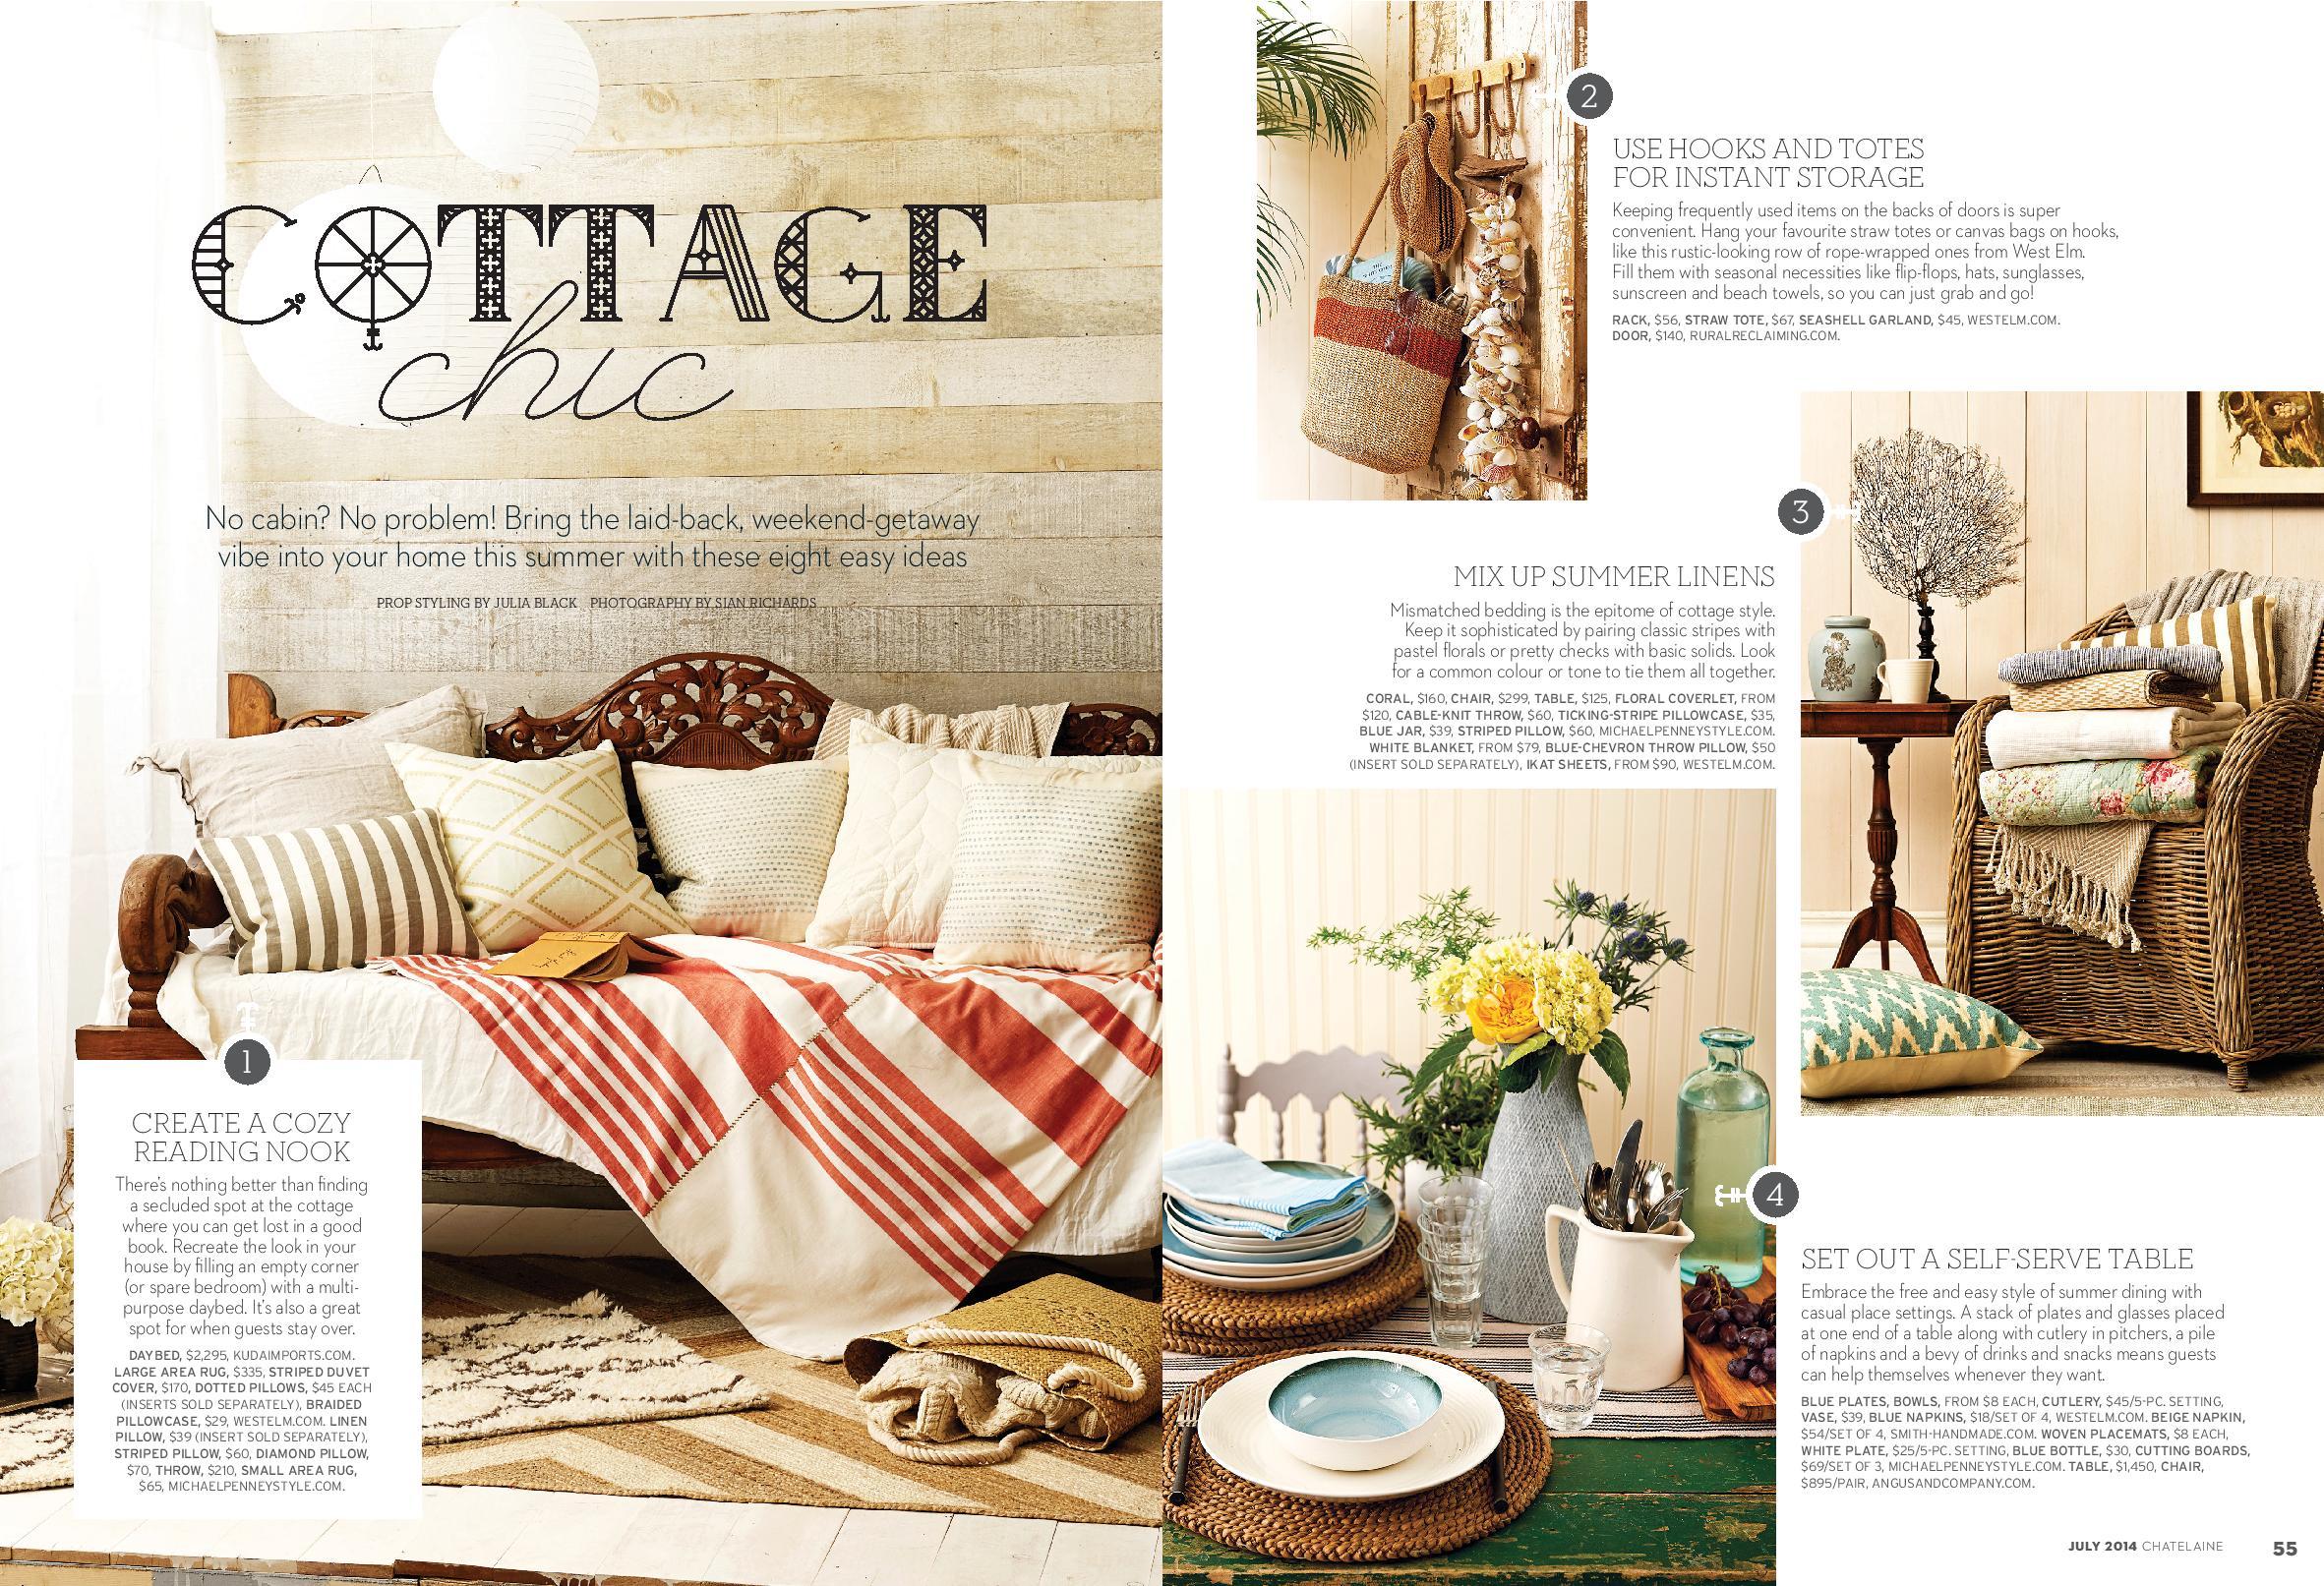 CottageChic-page-001.jpg